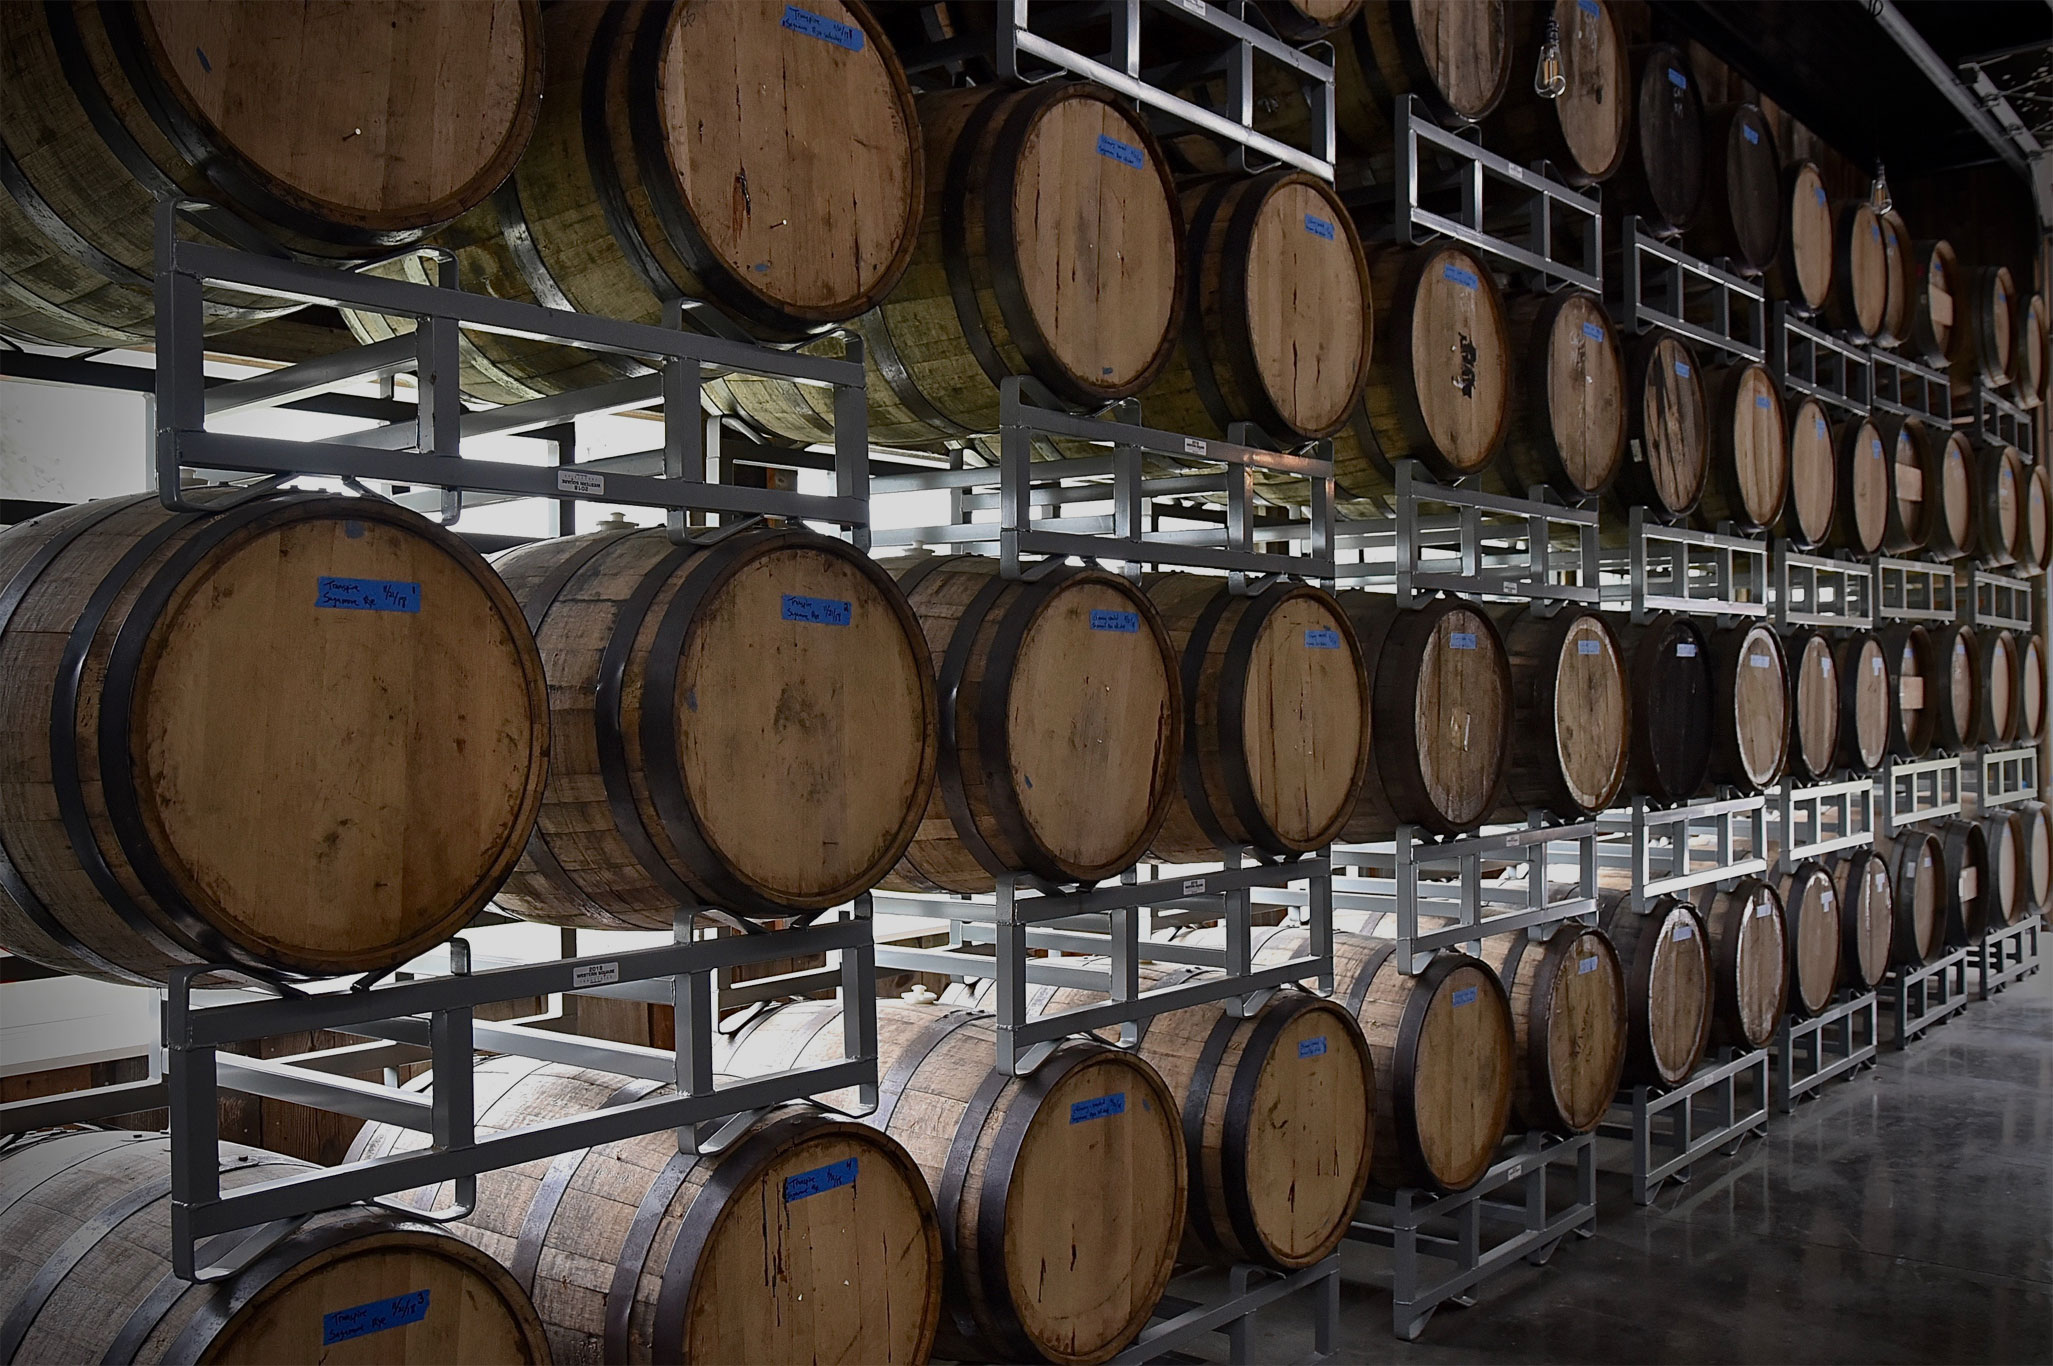 Elder Pine Beer Blending Equipment